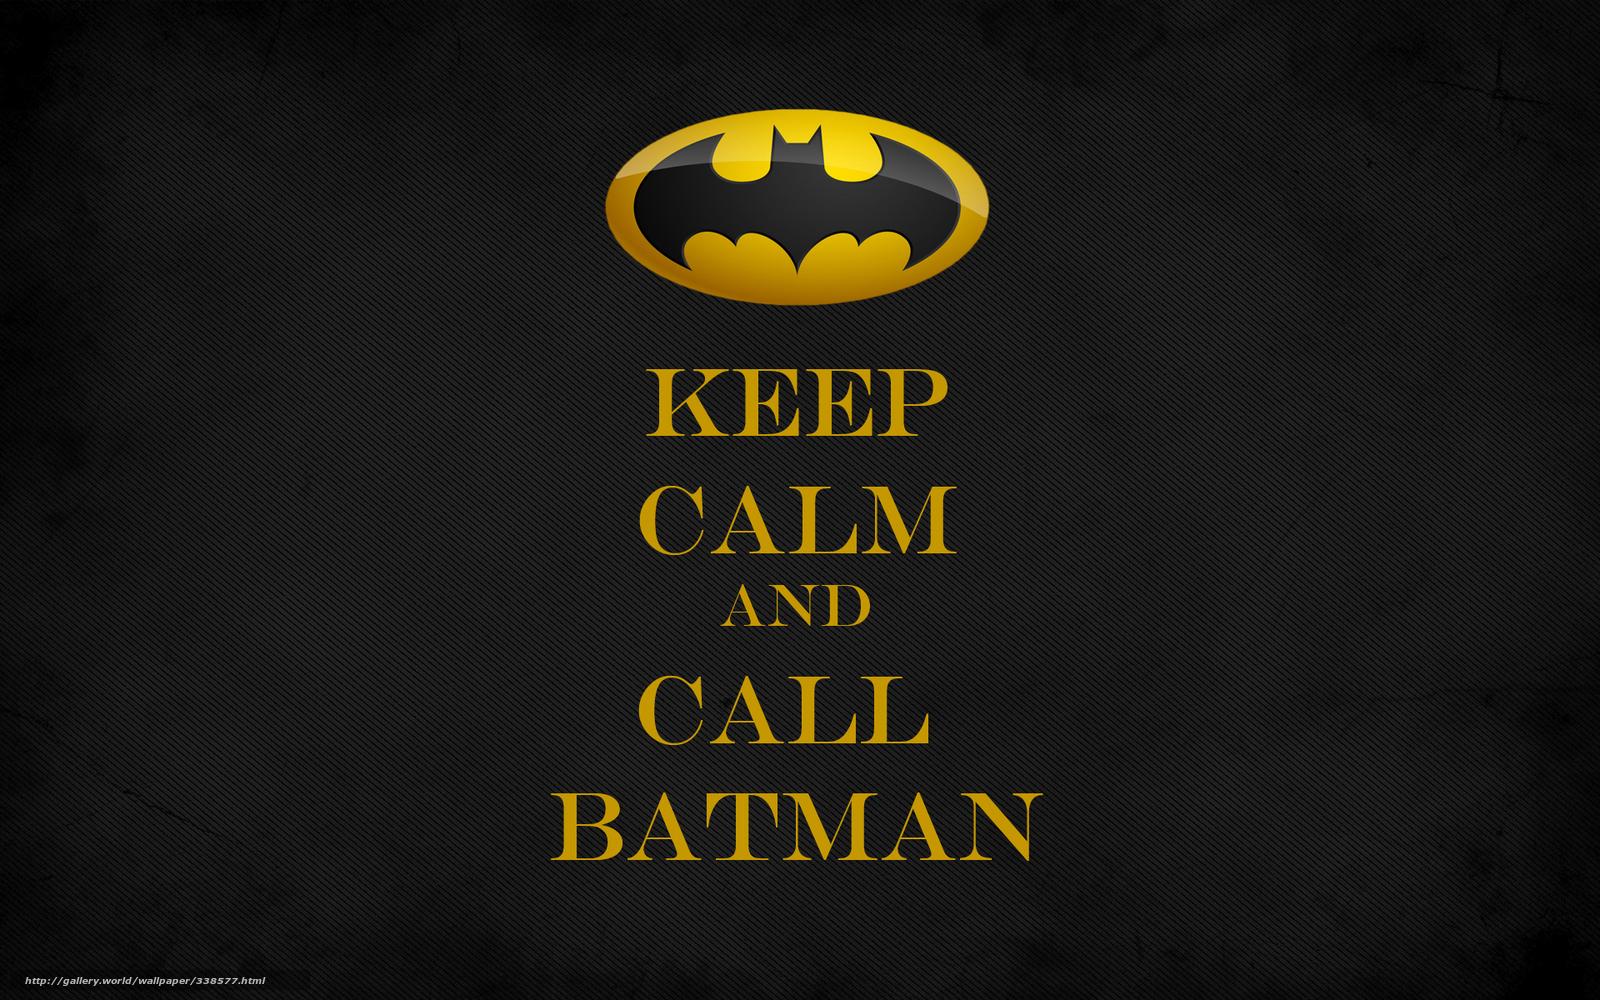 Download Wallpaper Keep Calm And Call Batman Minimalism 1600x1000